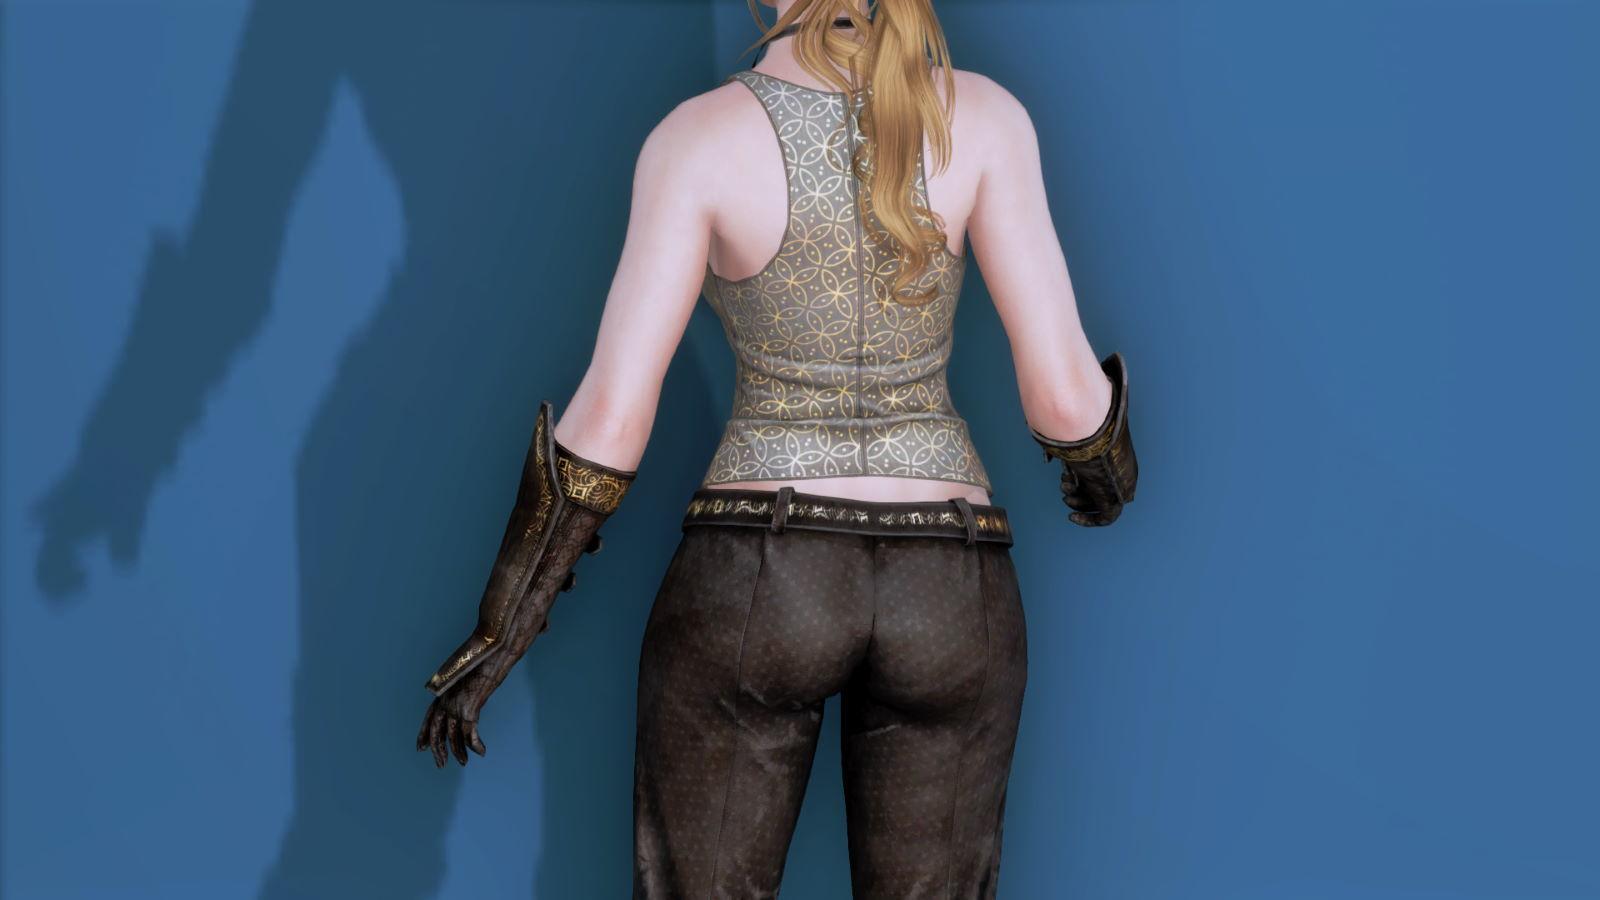 RuggedRogueSSE 233-1 Pose Up-Ba-F Vest Trouser 1